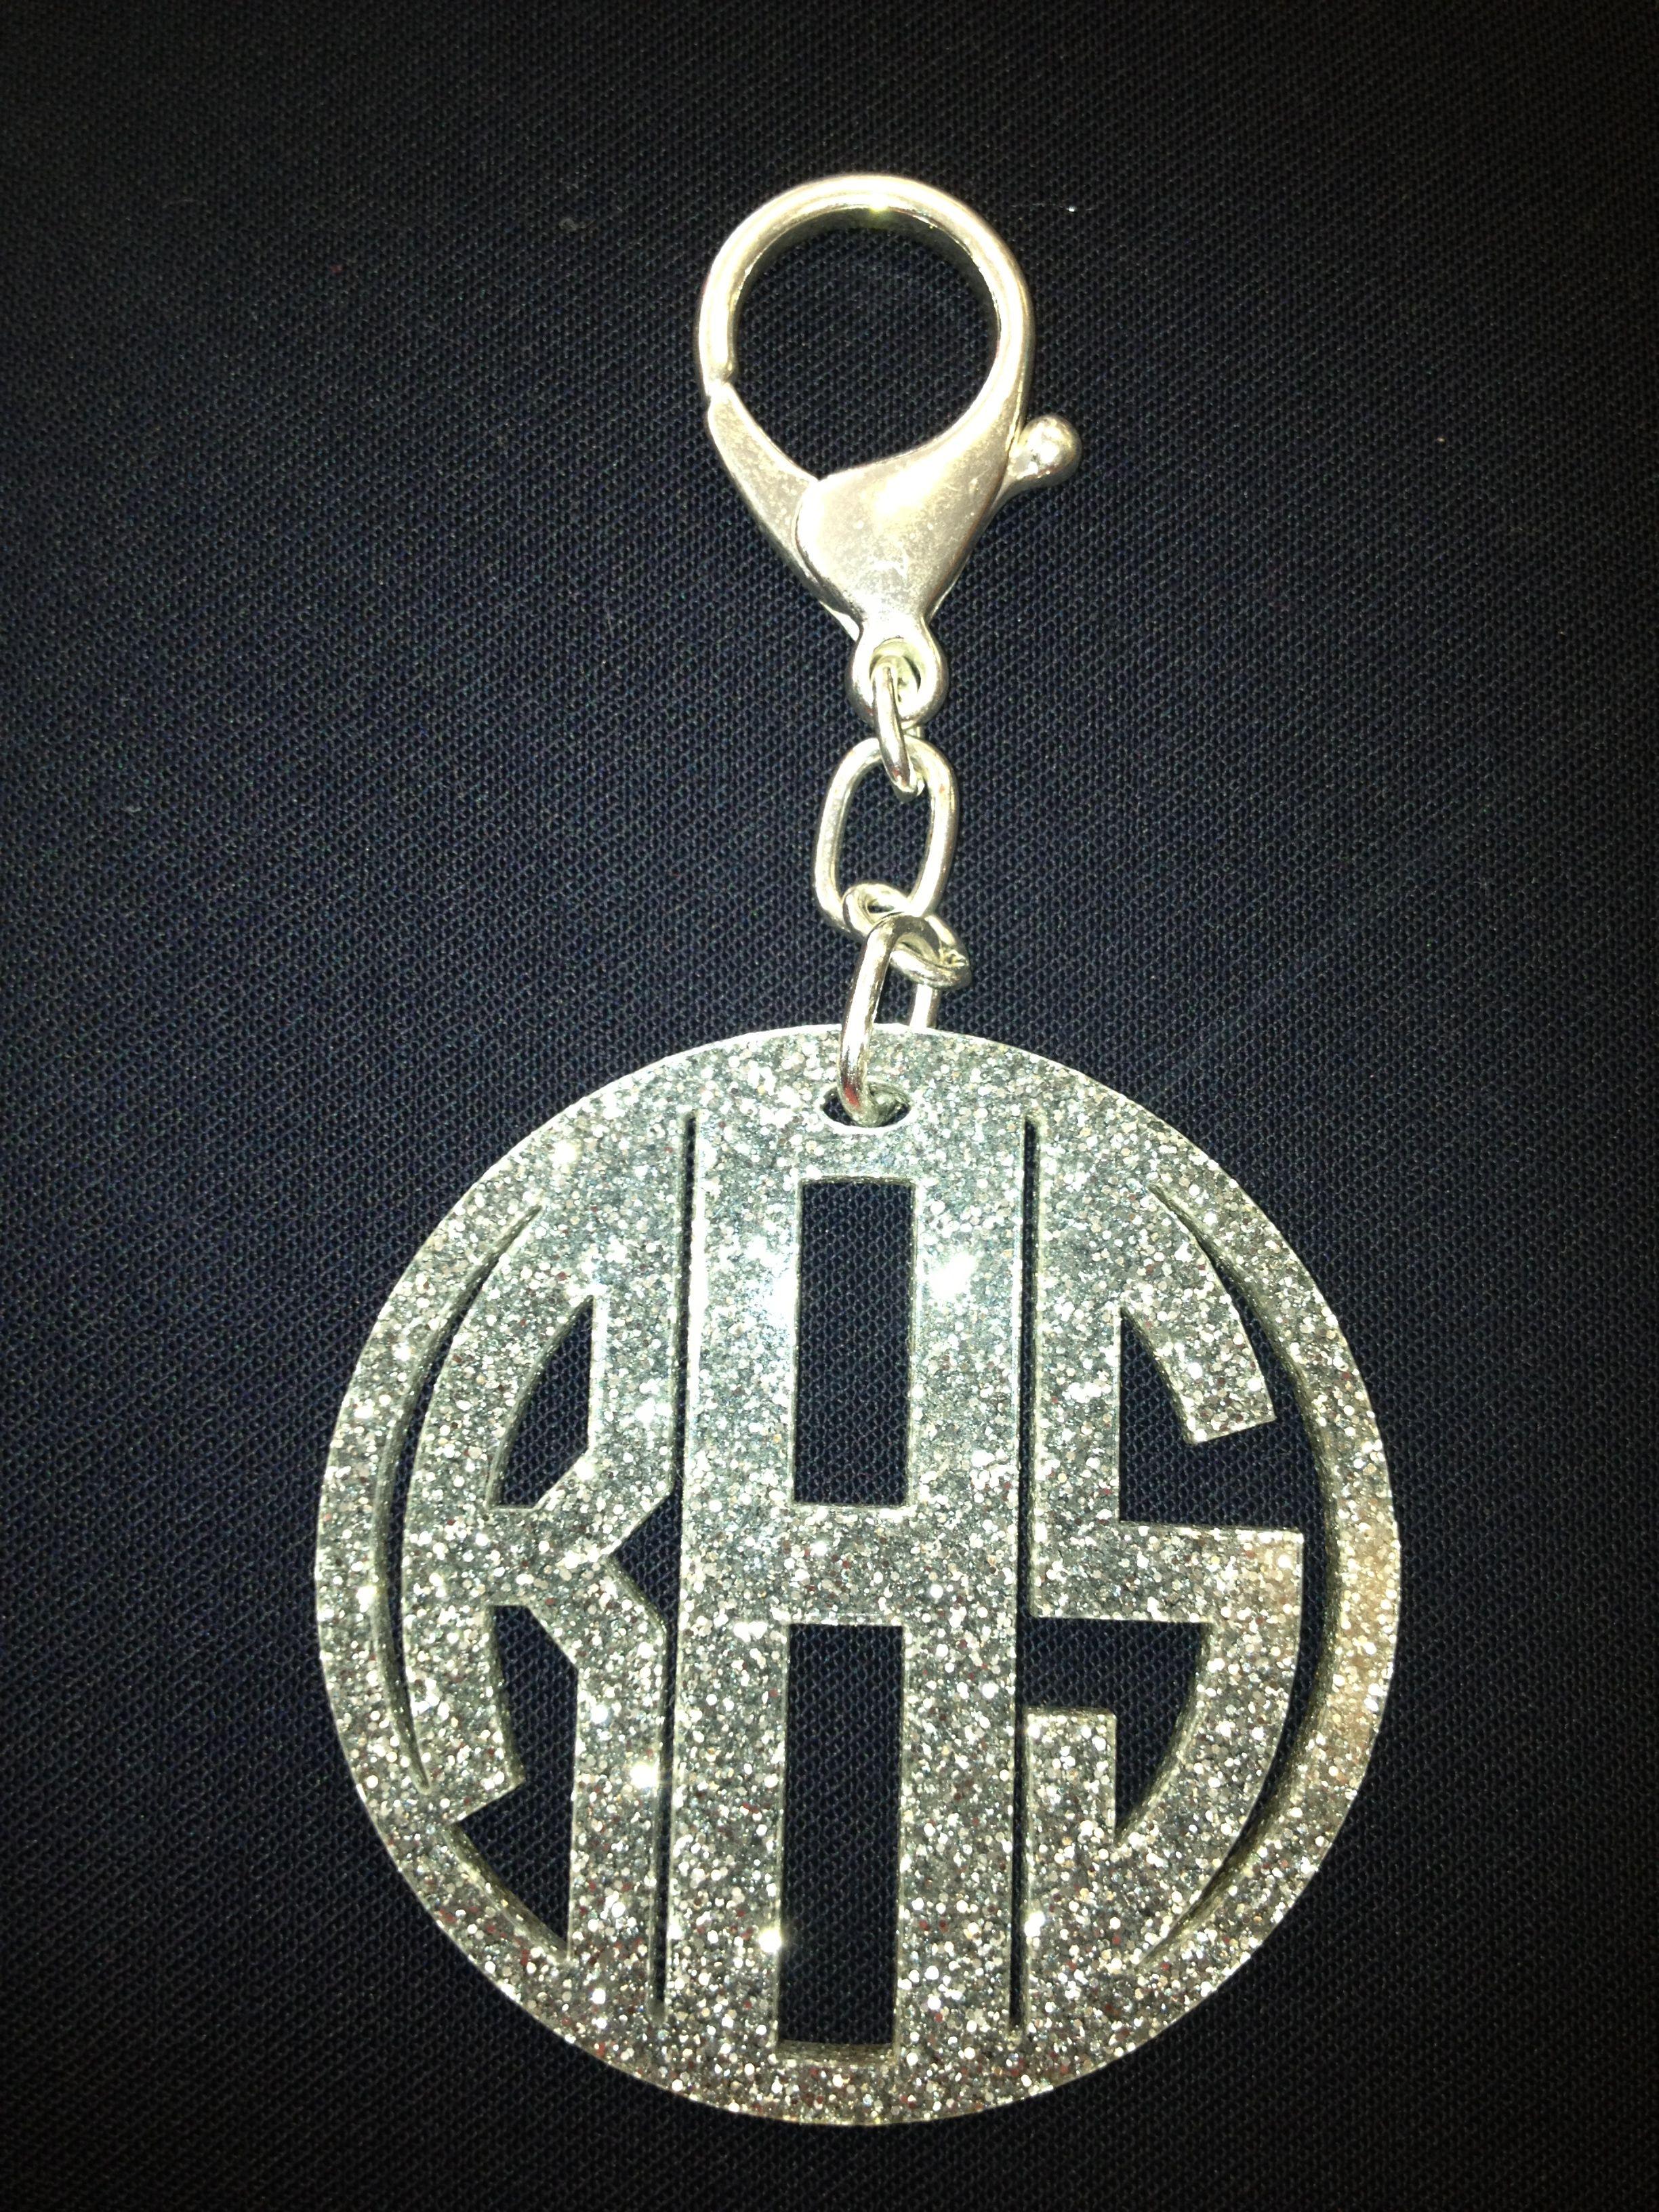 Silver glitter acrylic monogram keychain